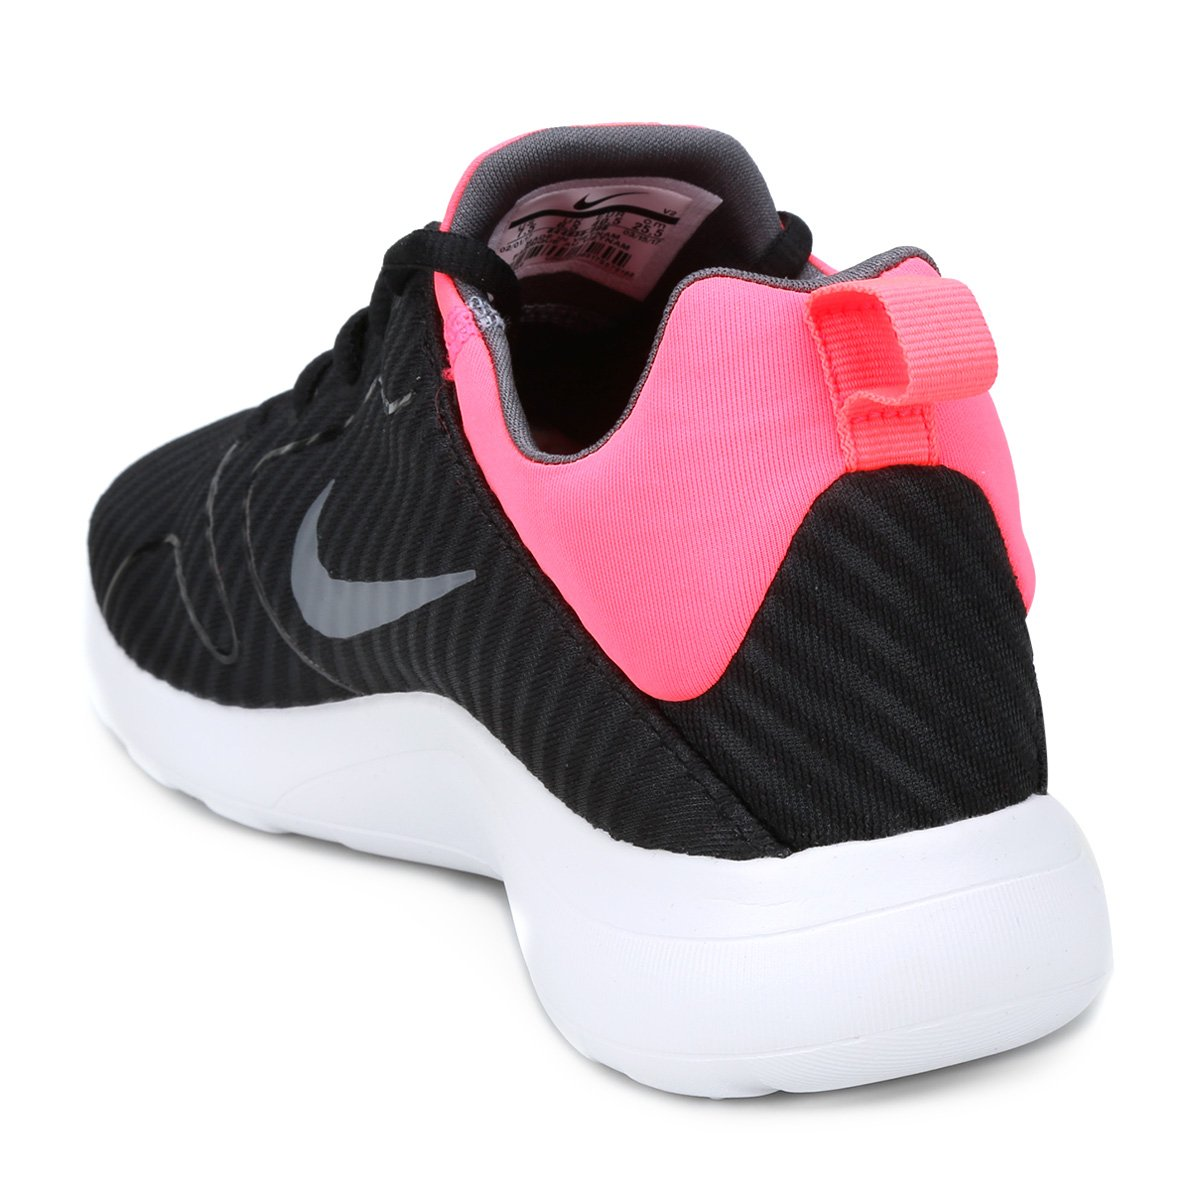 e Preto Kaishi Nike 2 Tênis Vermelho Se 0 Masculino Fv10q